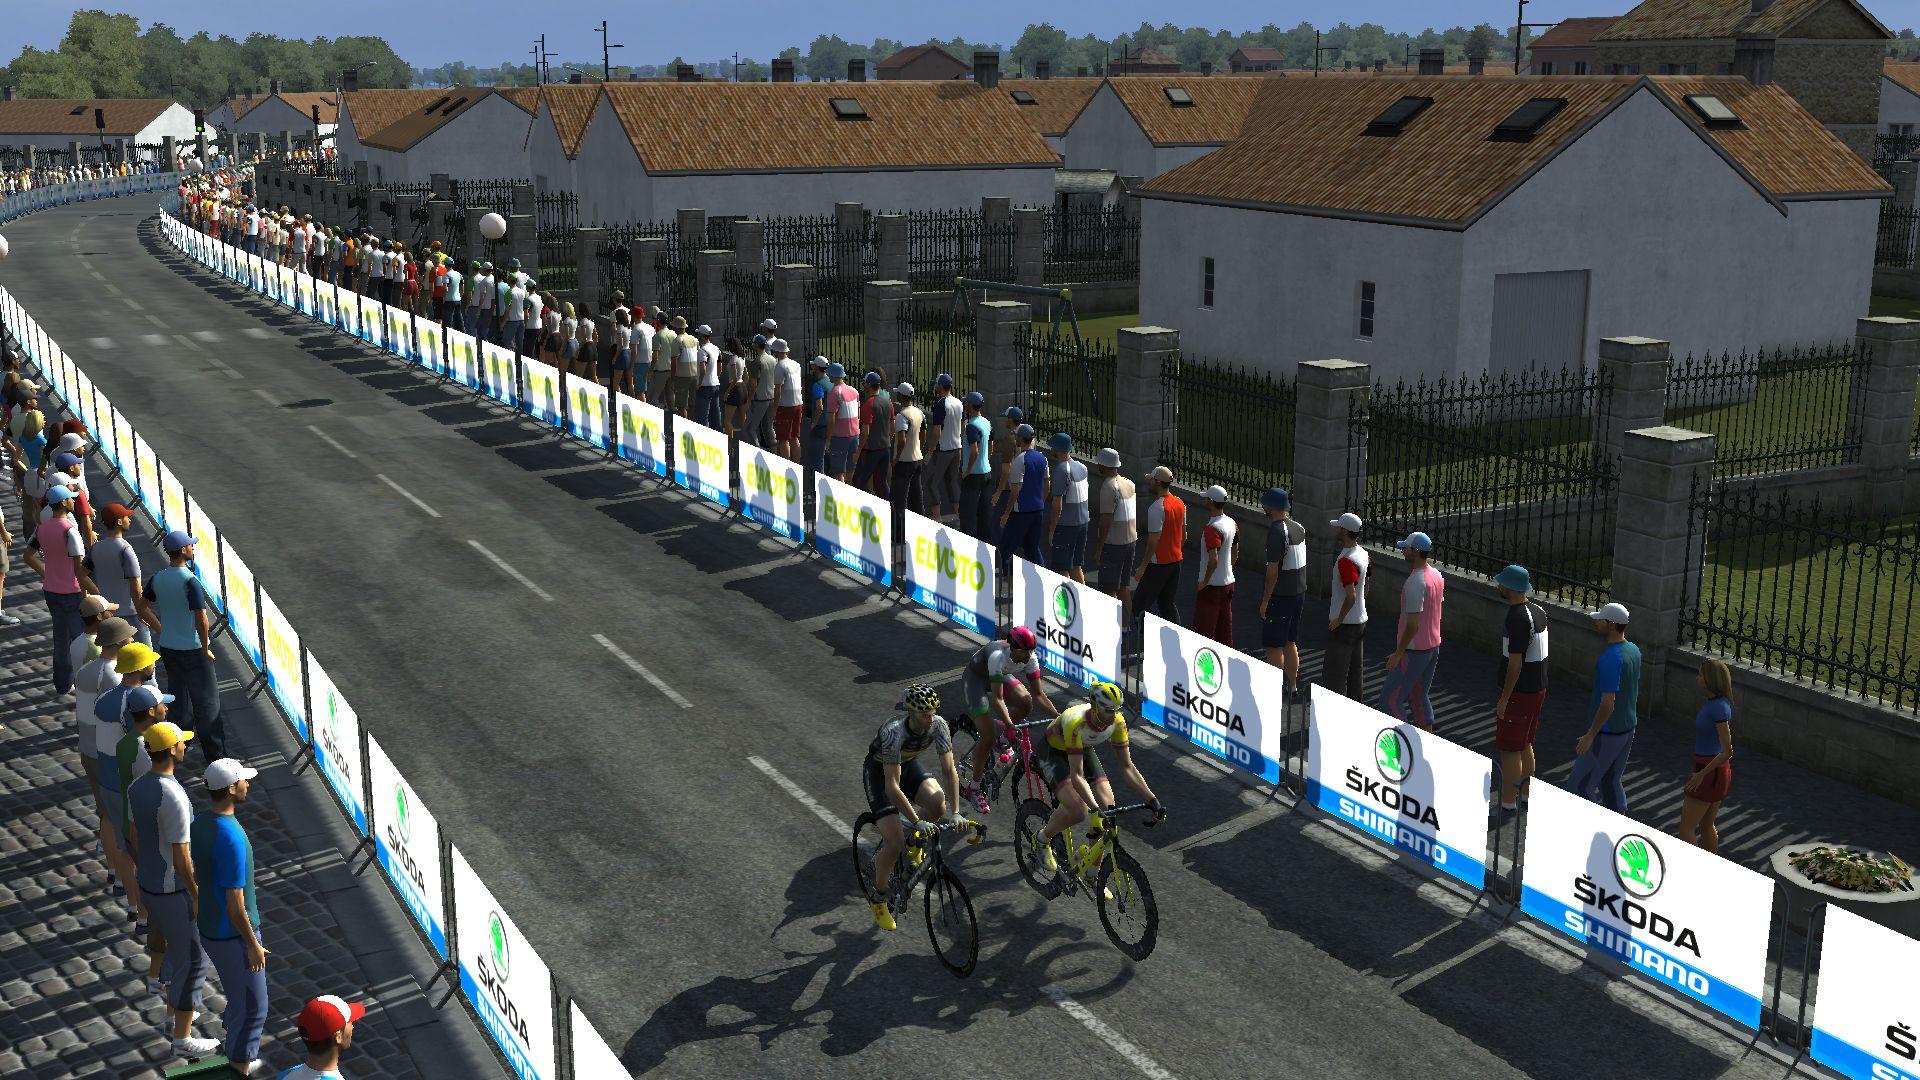 pcmdaily.com/images/mg/2018/Races/GTM/Giro/mg18_giro_07_PCM0074.jpg